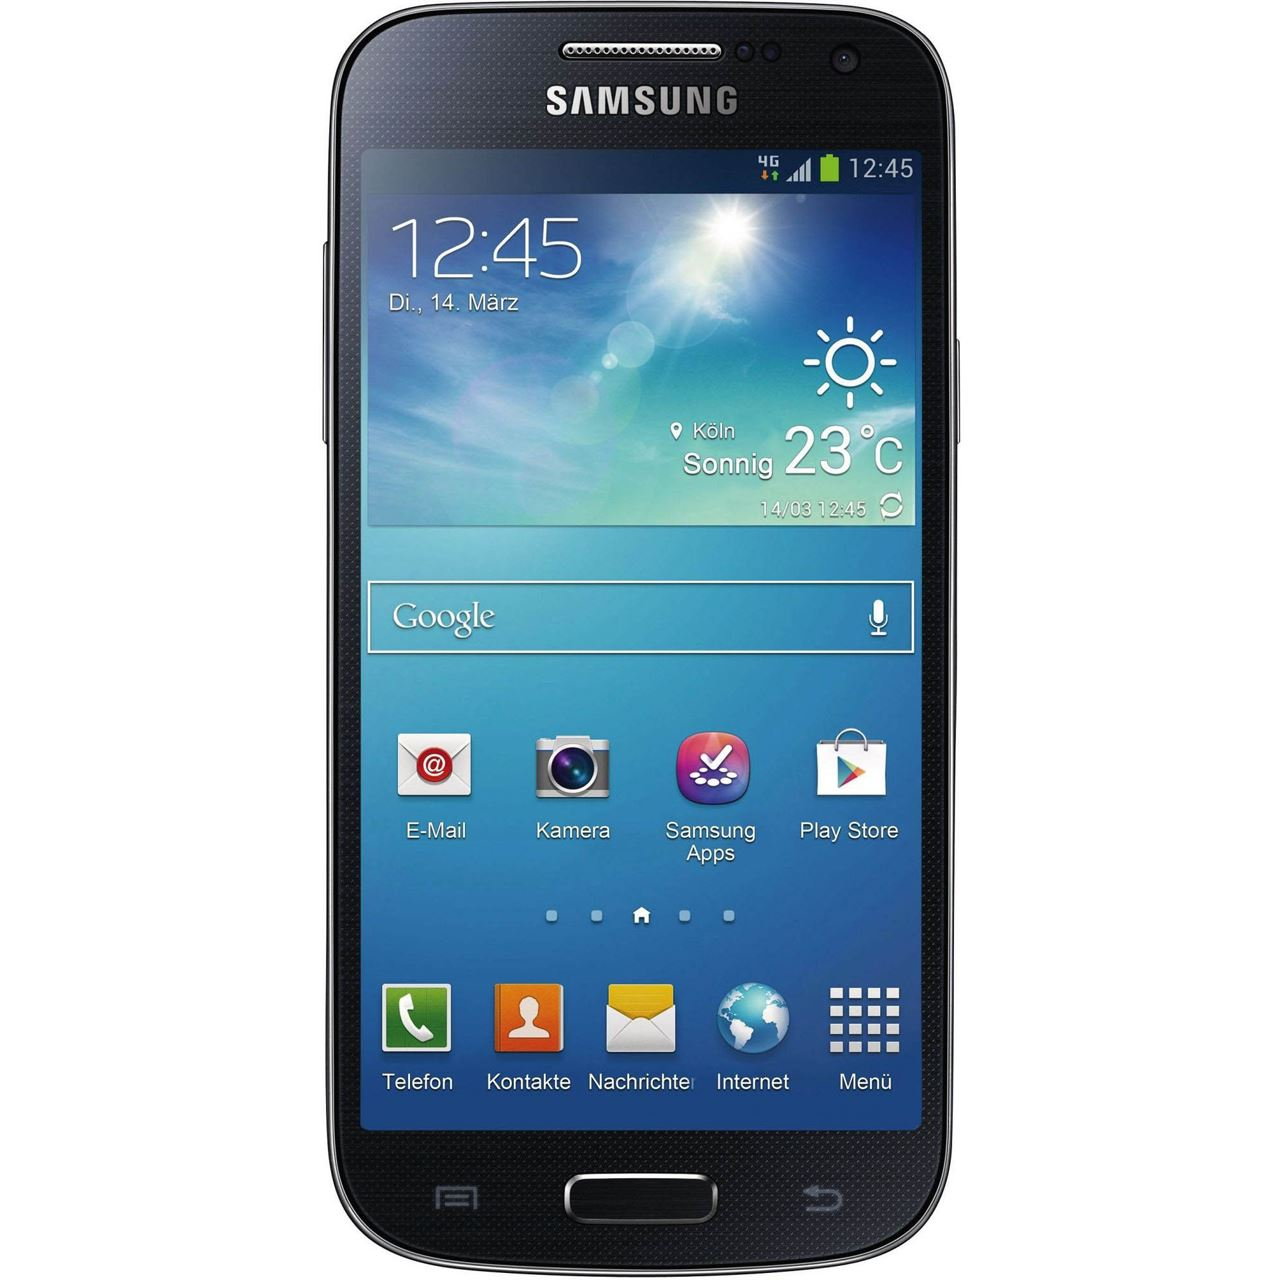 samsung galaxy s4 mini i9195 8 gb schwarz smartphones. Black Bedroom Furniture Sets. Home Design Ideas